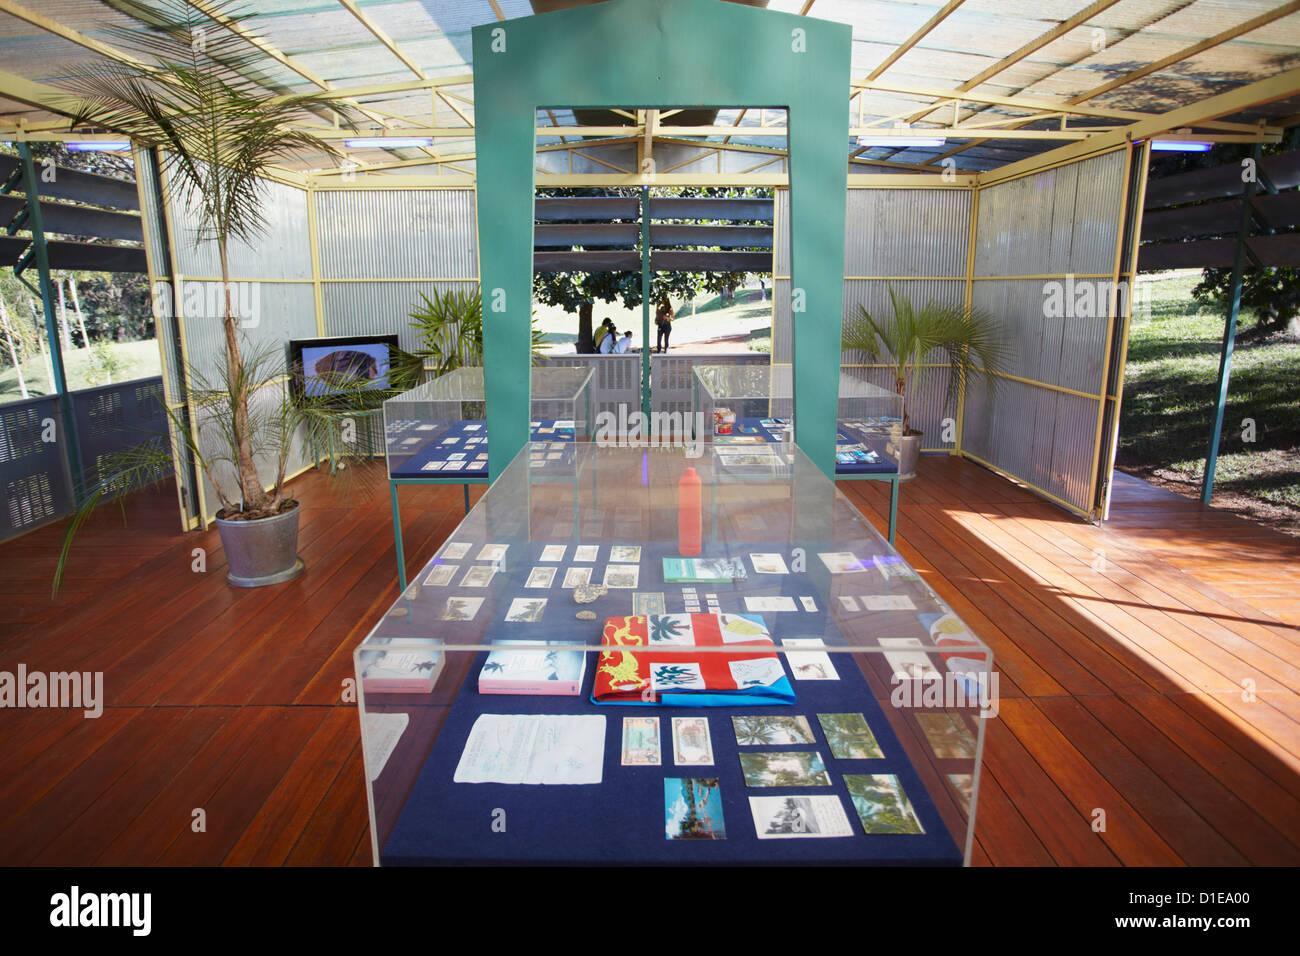 Modern art pavilion by Rirkrit Tiravanija at Centro de Arte Contemporanea Inhotim, Belo Horizonte, Minas Gerais, - Stock Image